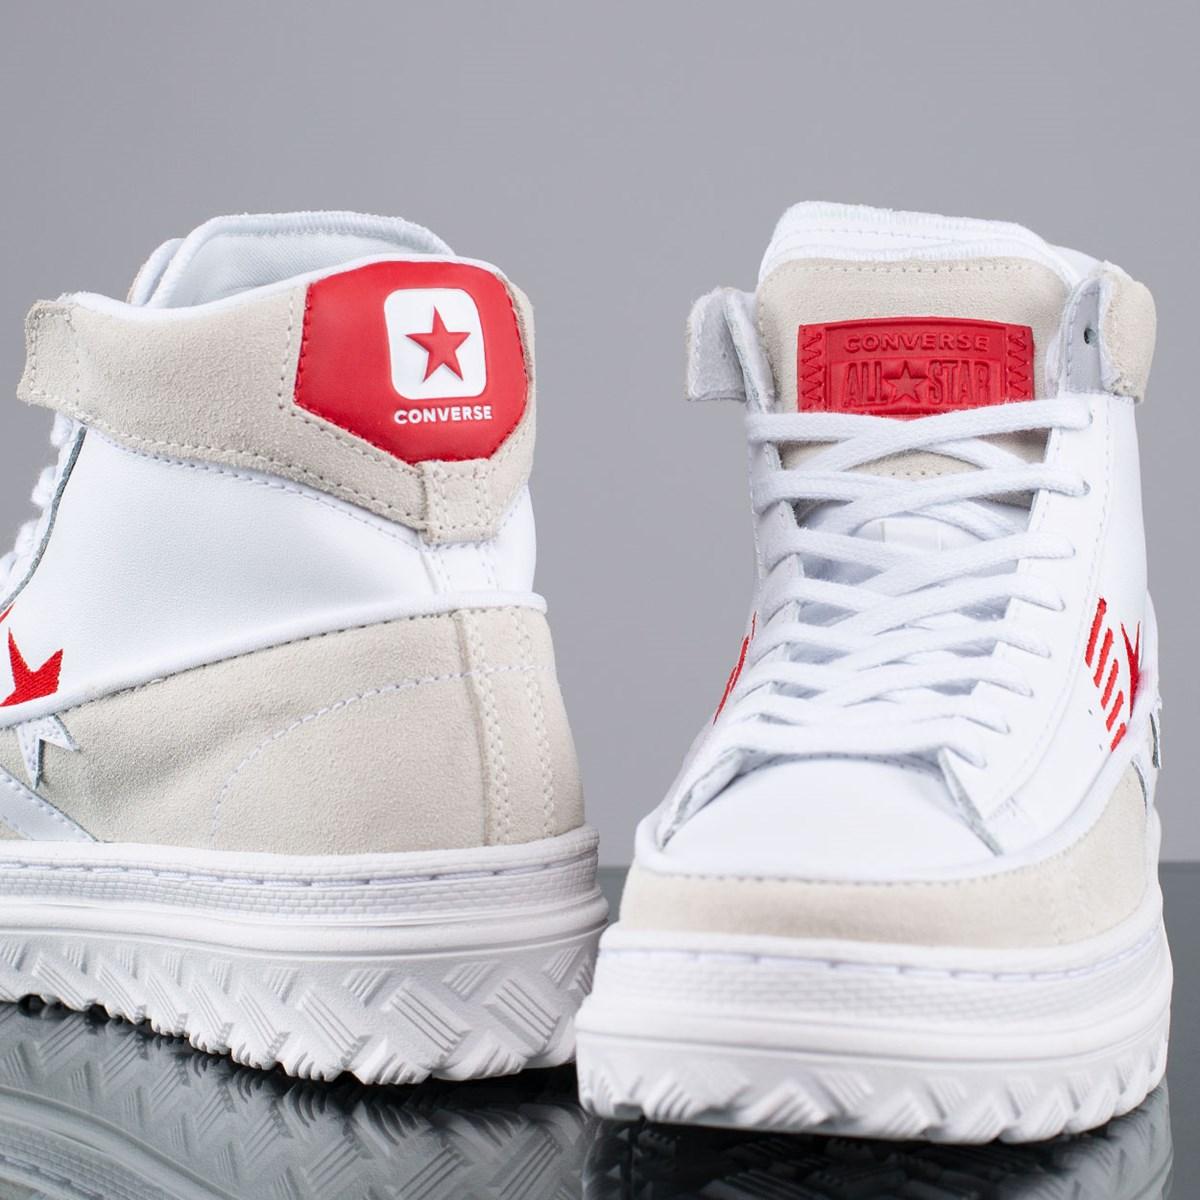 Tênis Converse Pro Leather X2 Rivals Hi Egret White University Red 168761C